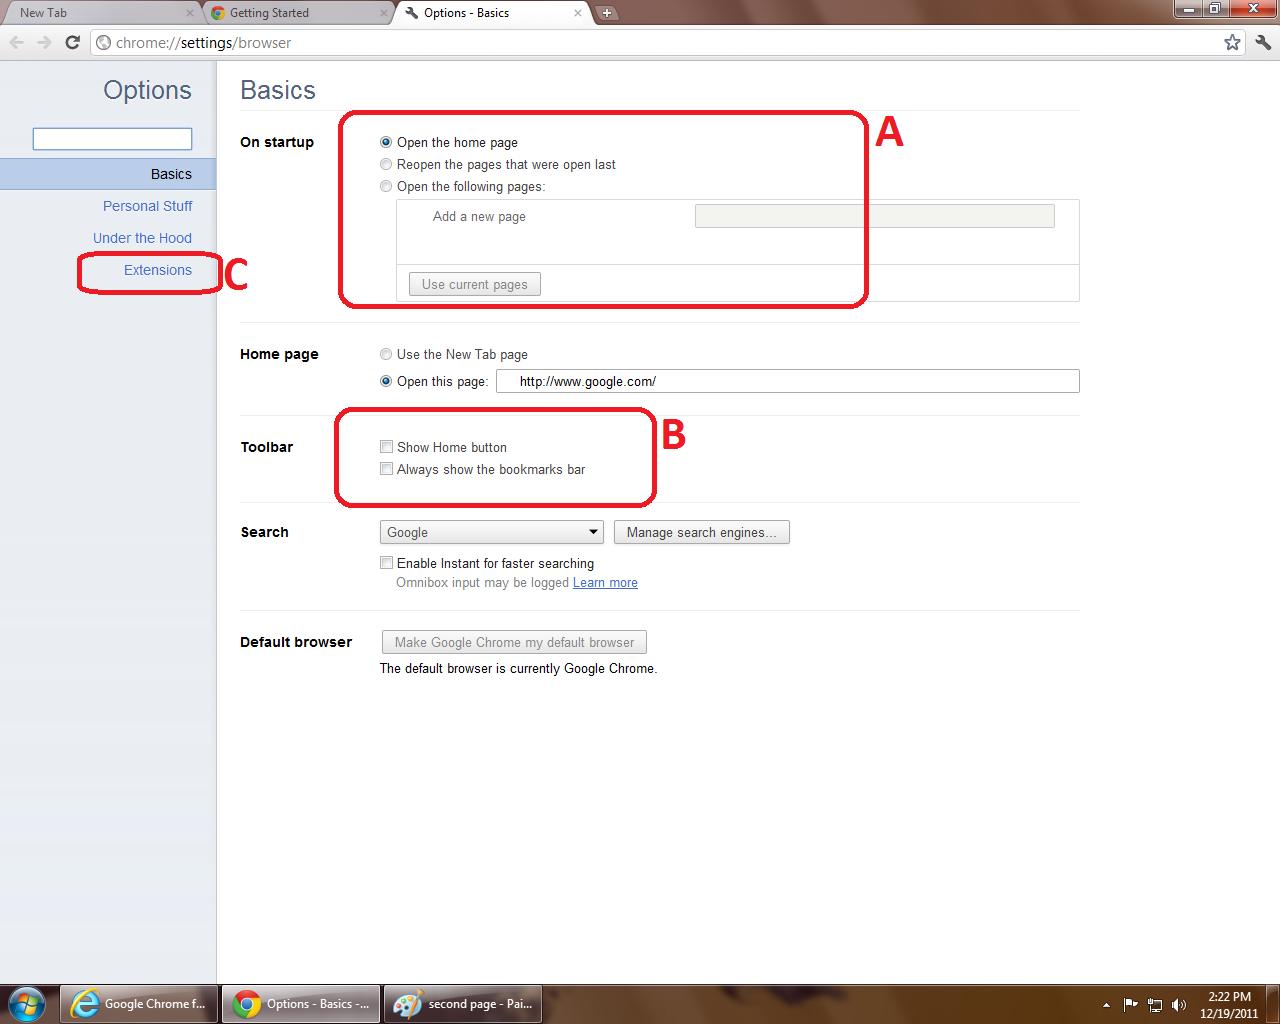 MDC Computers   Help! I keep getting viruses even with Antivirus